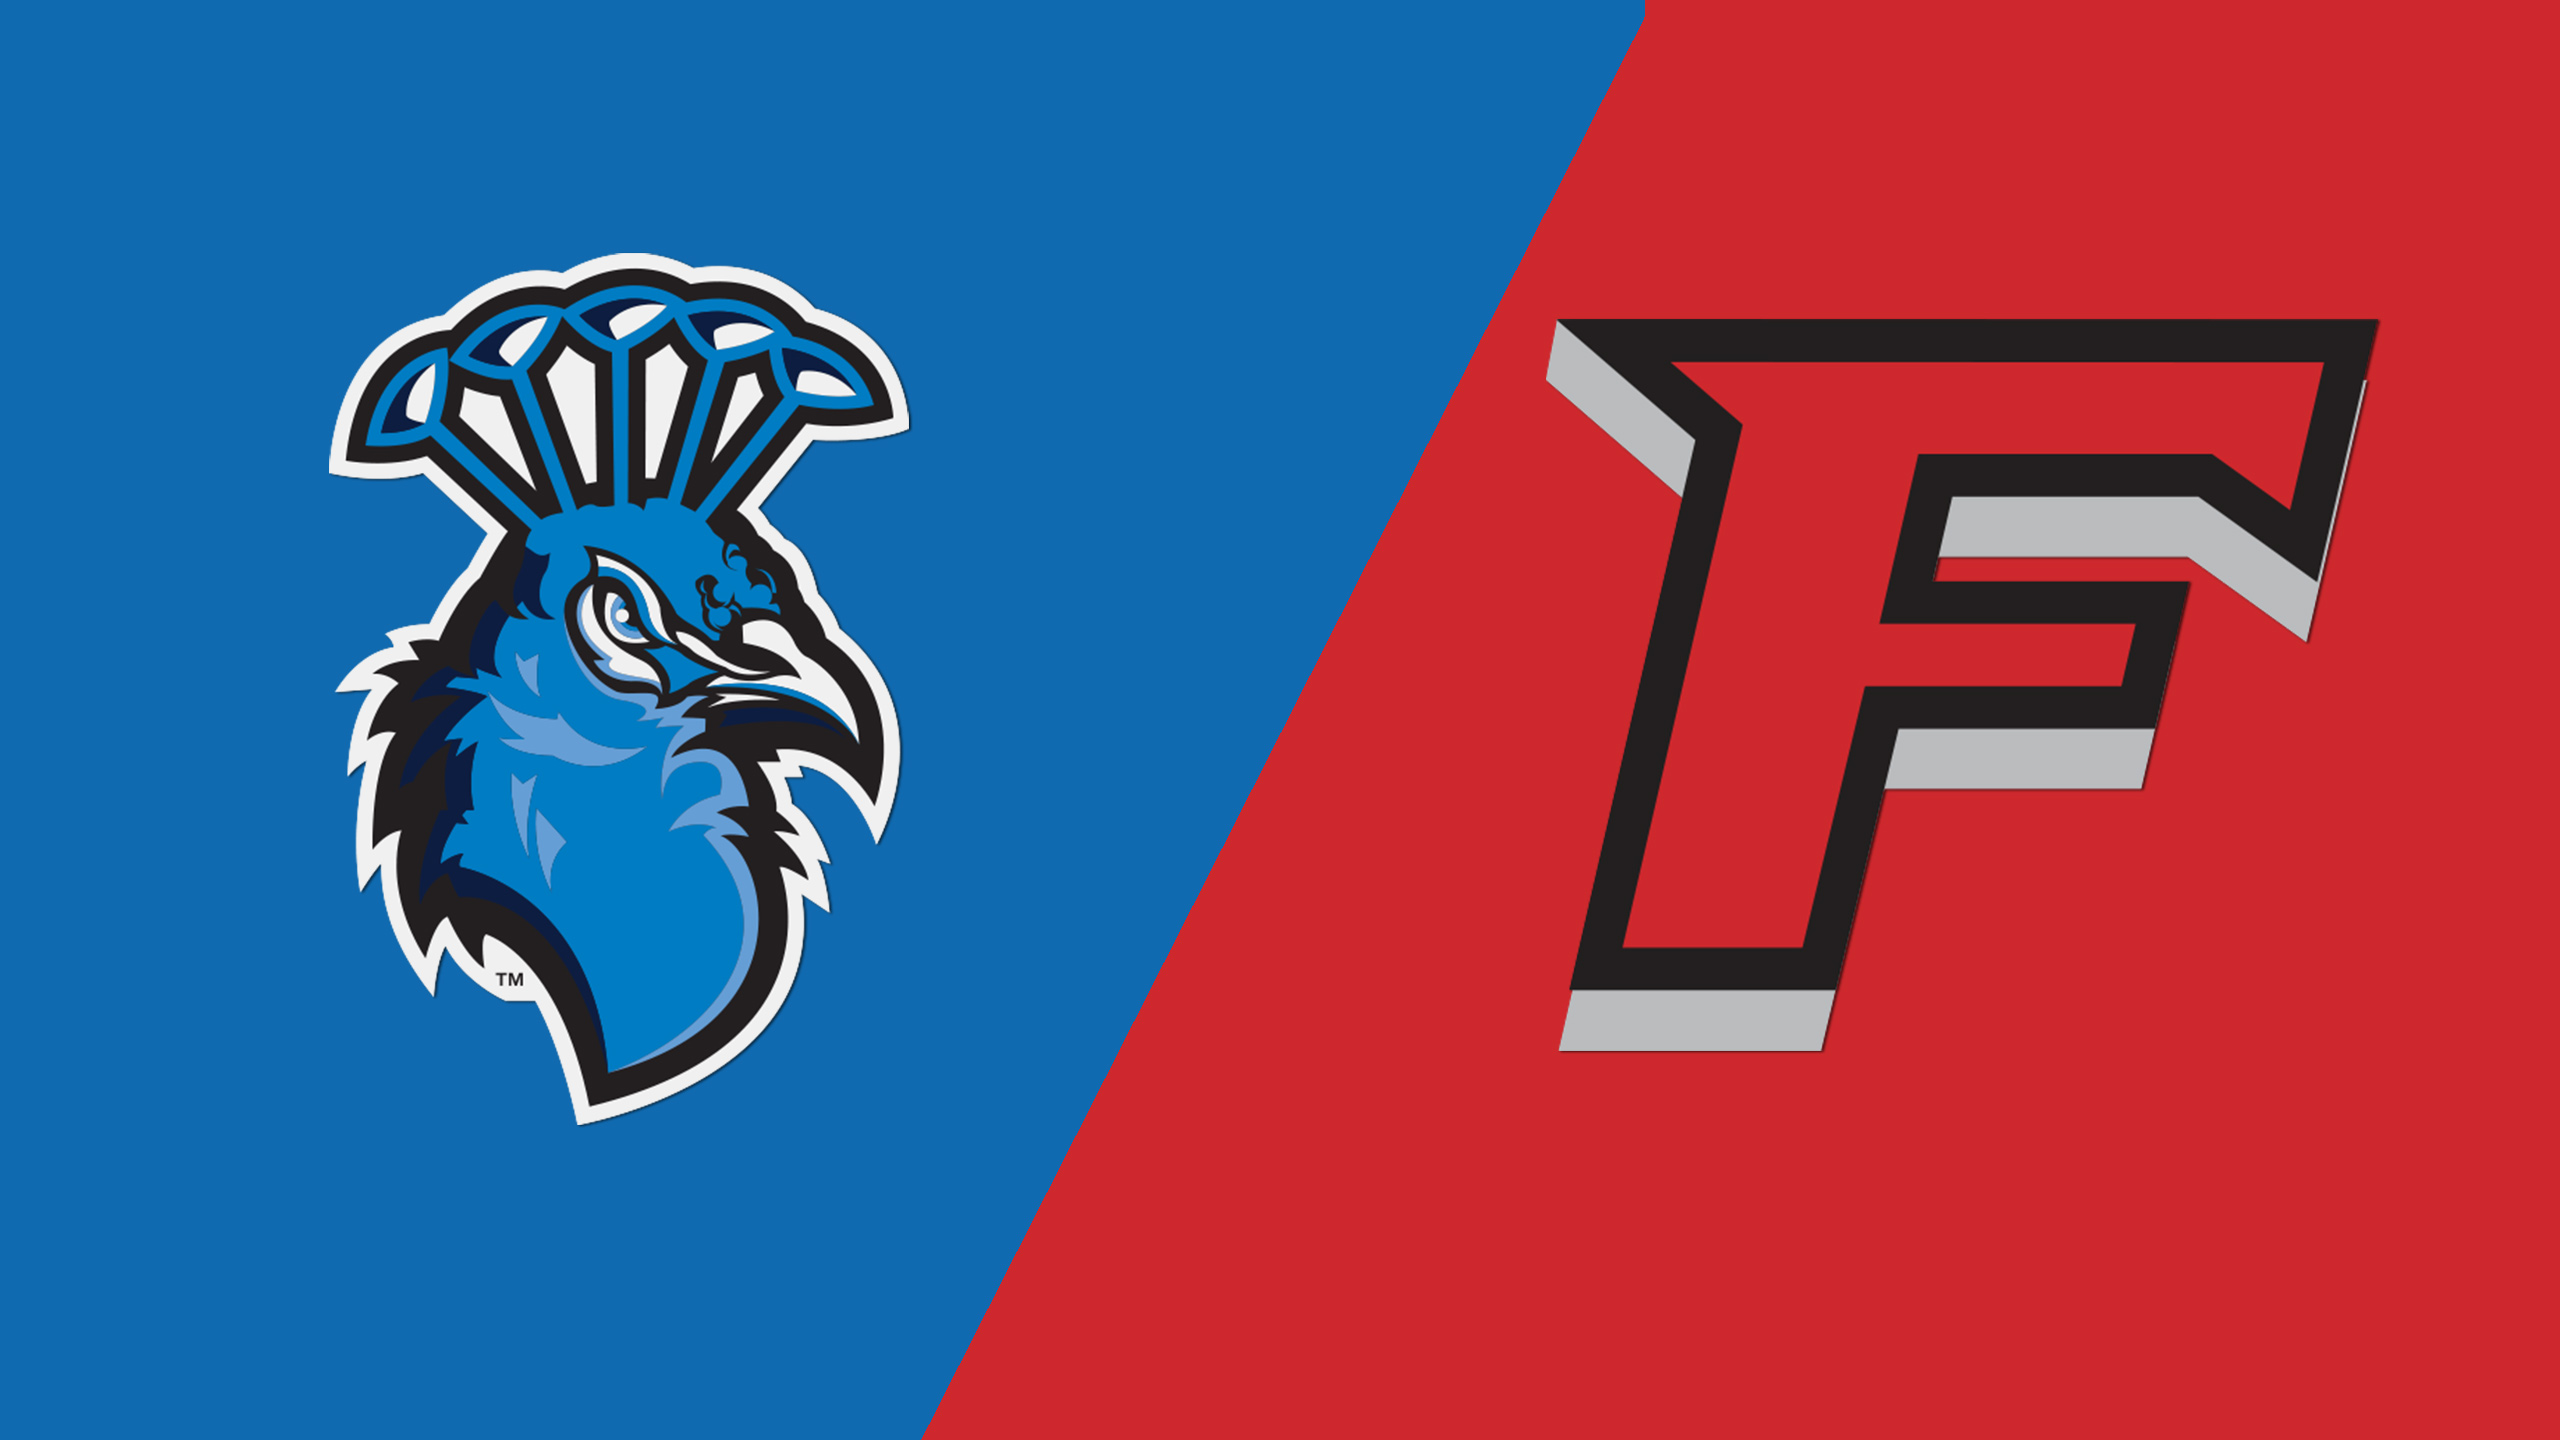 Saint Peter's vs. Fairfield (W Volleyball)